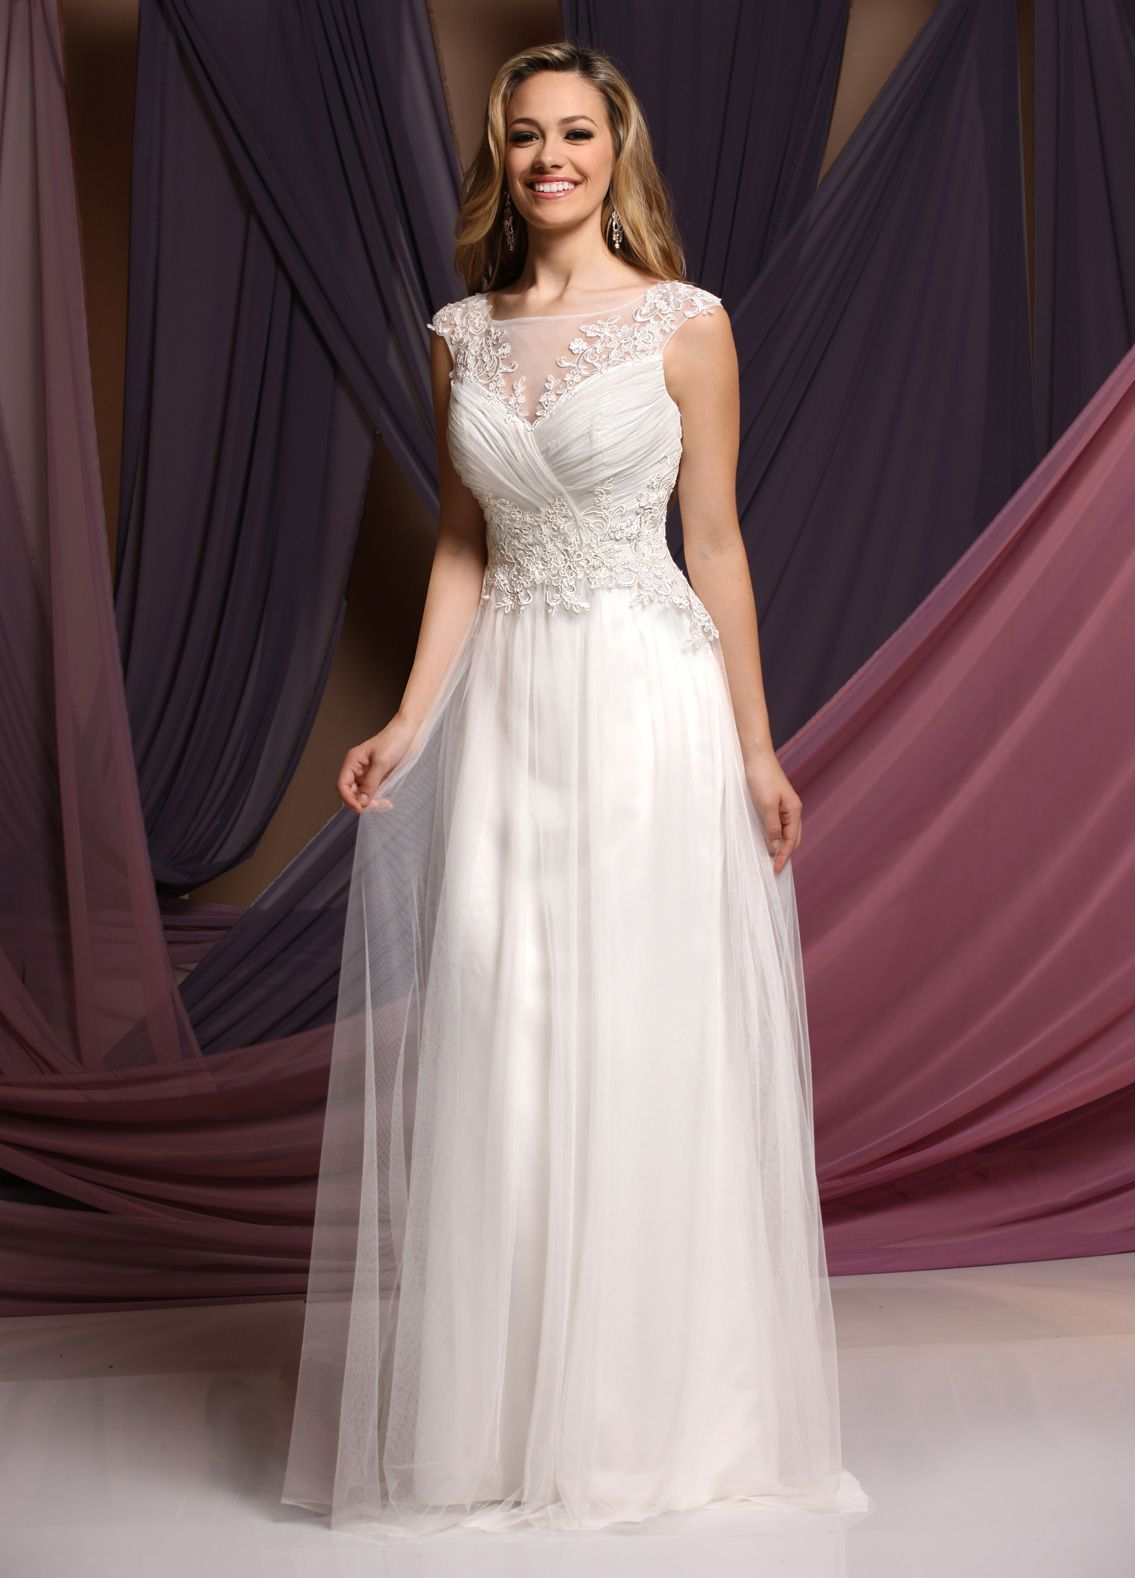 Davinci Wedding Dresses - Style F7034 | Beautiful gowns | Pinterest ...